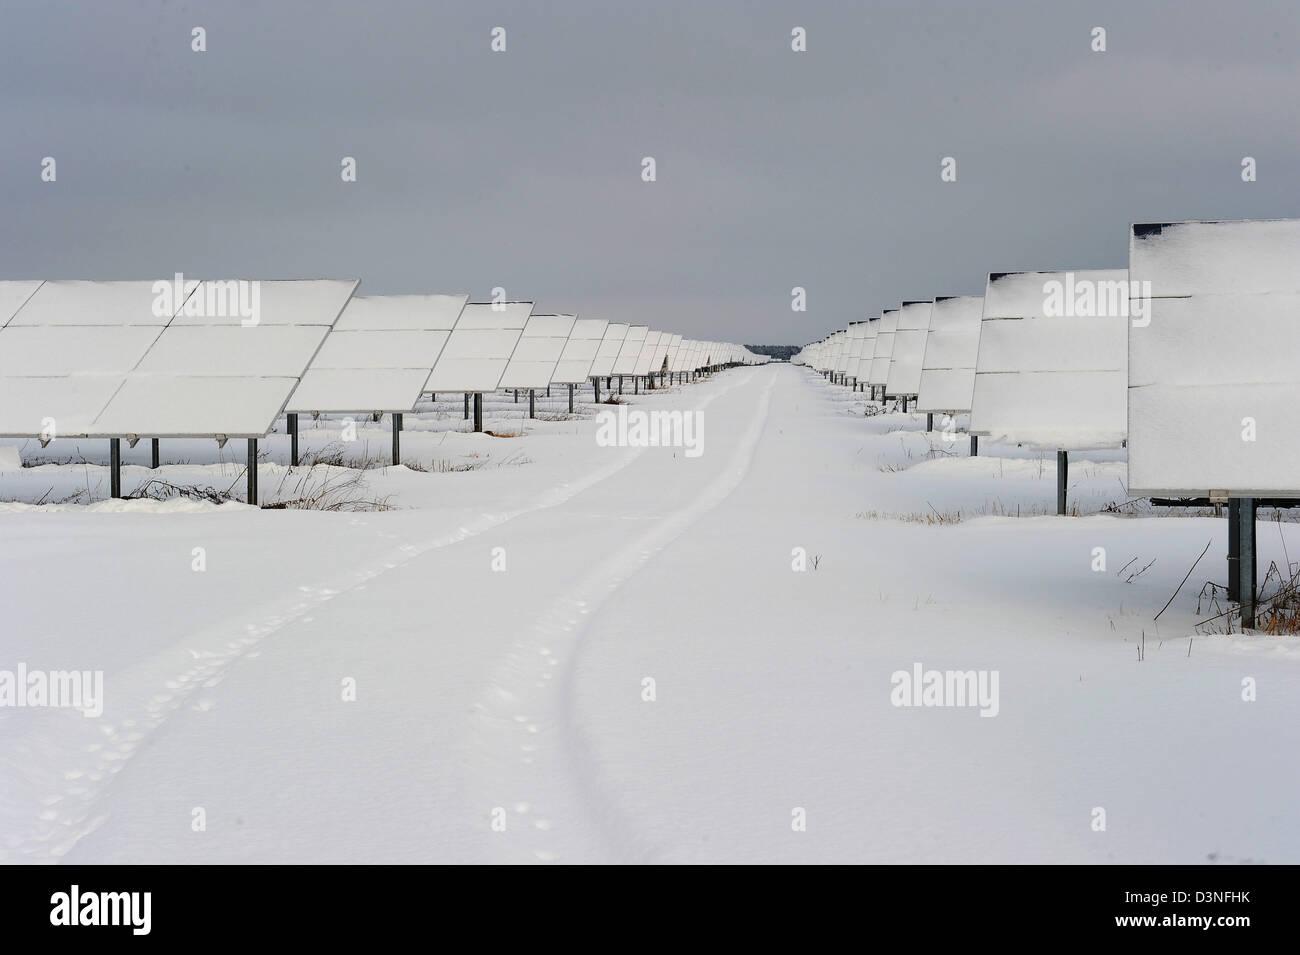 Megawatts Stock Photos Amp Megawatts Stock Images Alamy